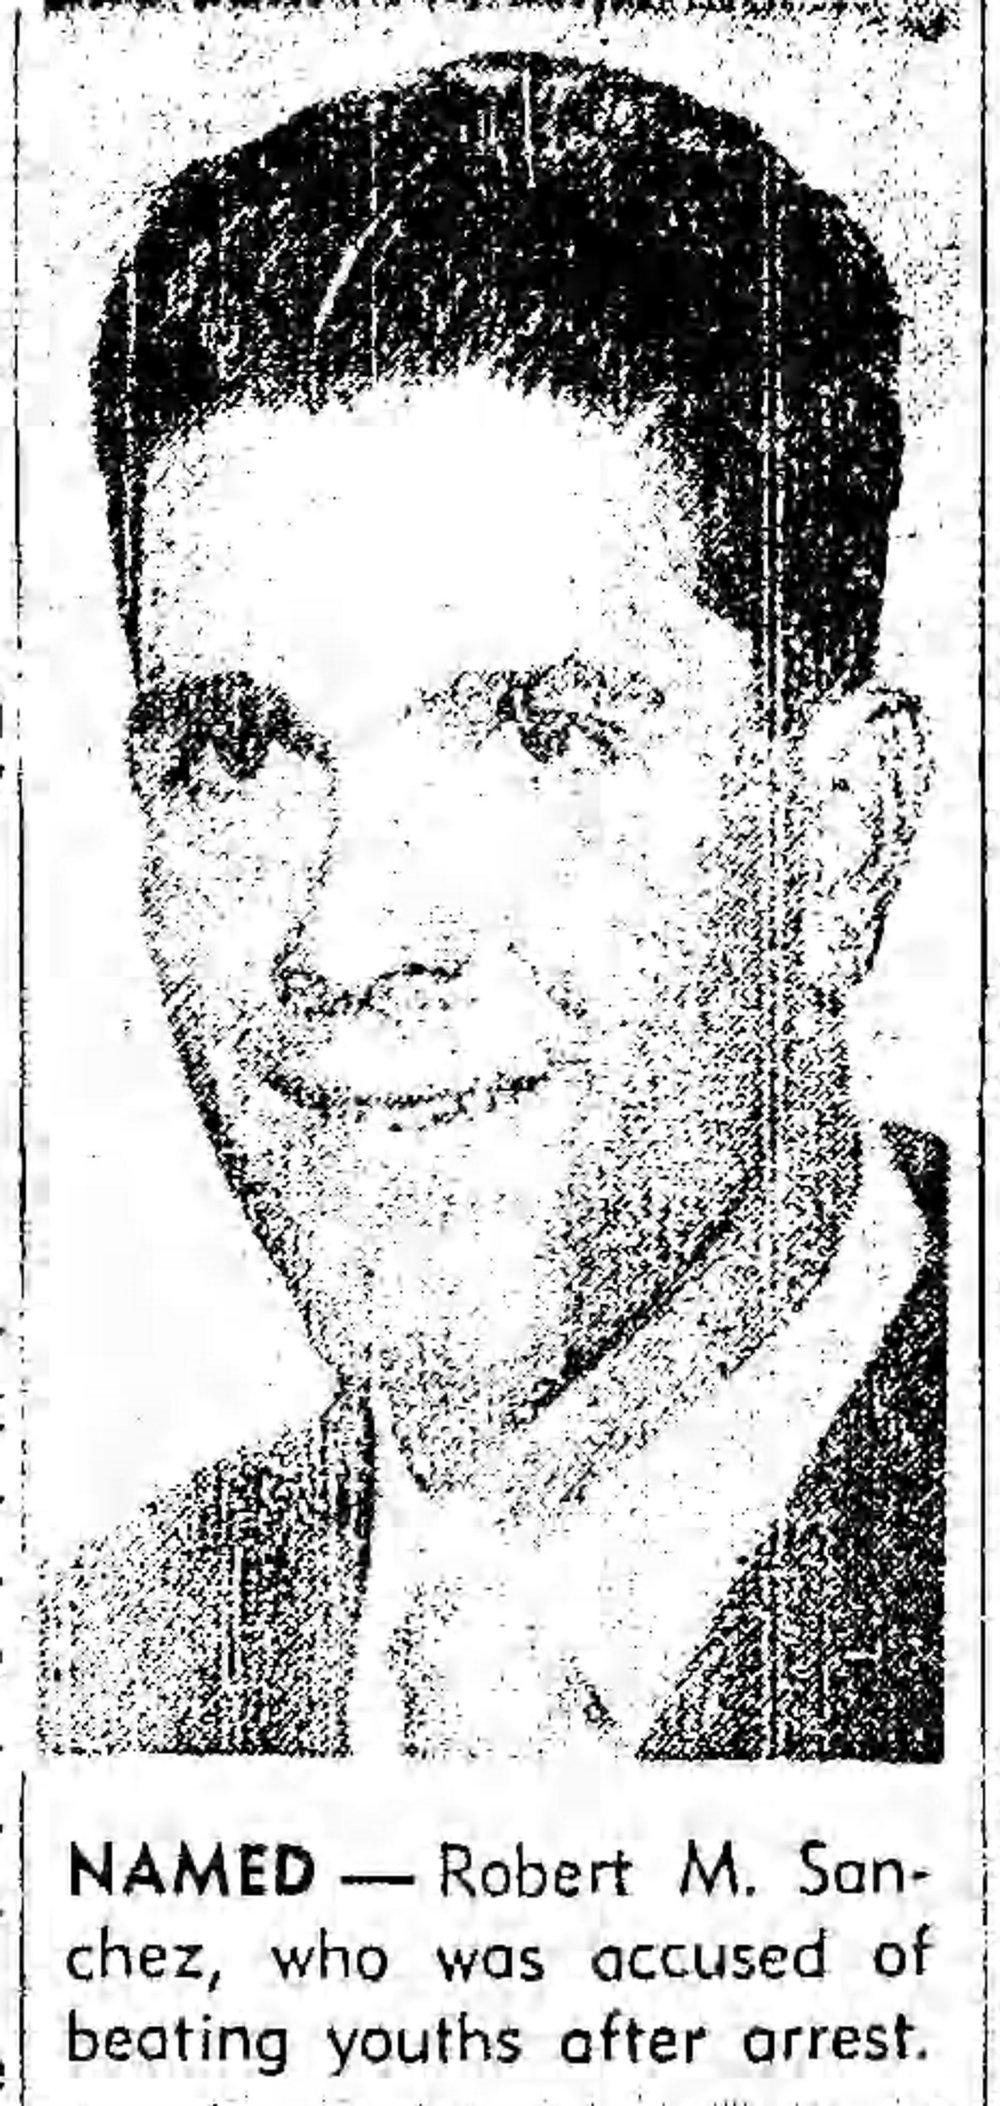 The_Los_Angeles_Times_Wed__Apr_23__1952_.jpg